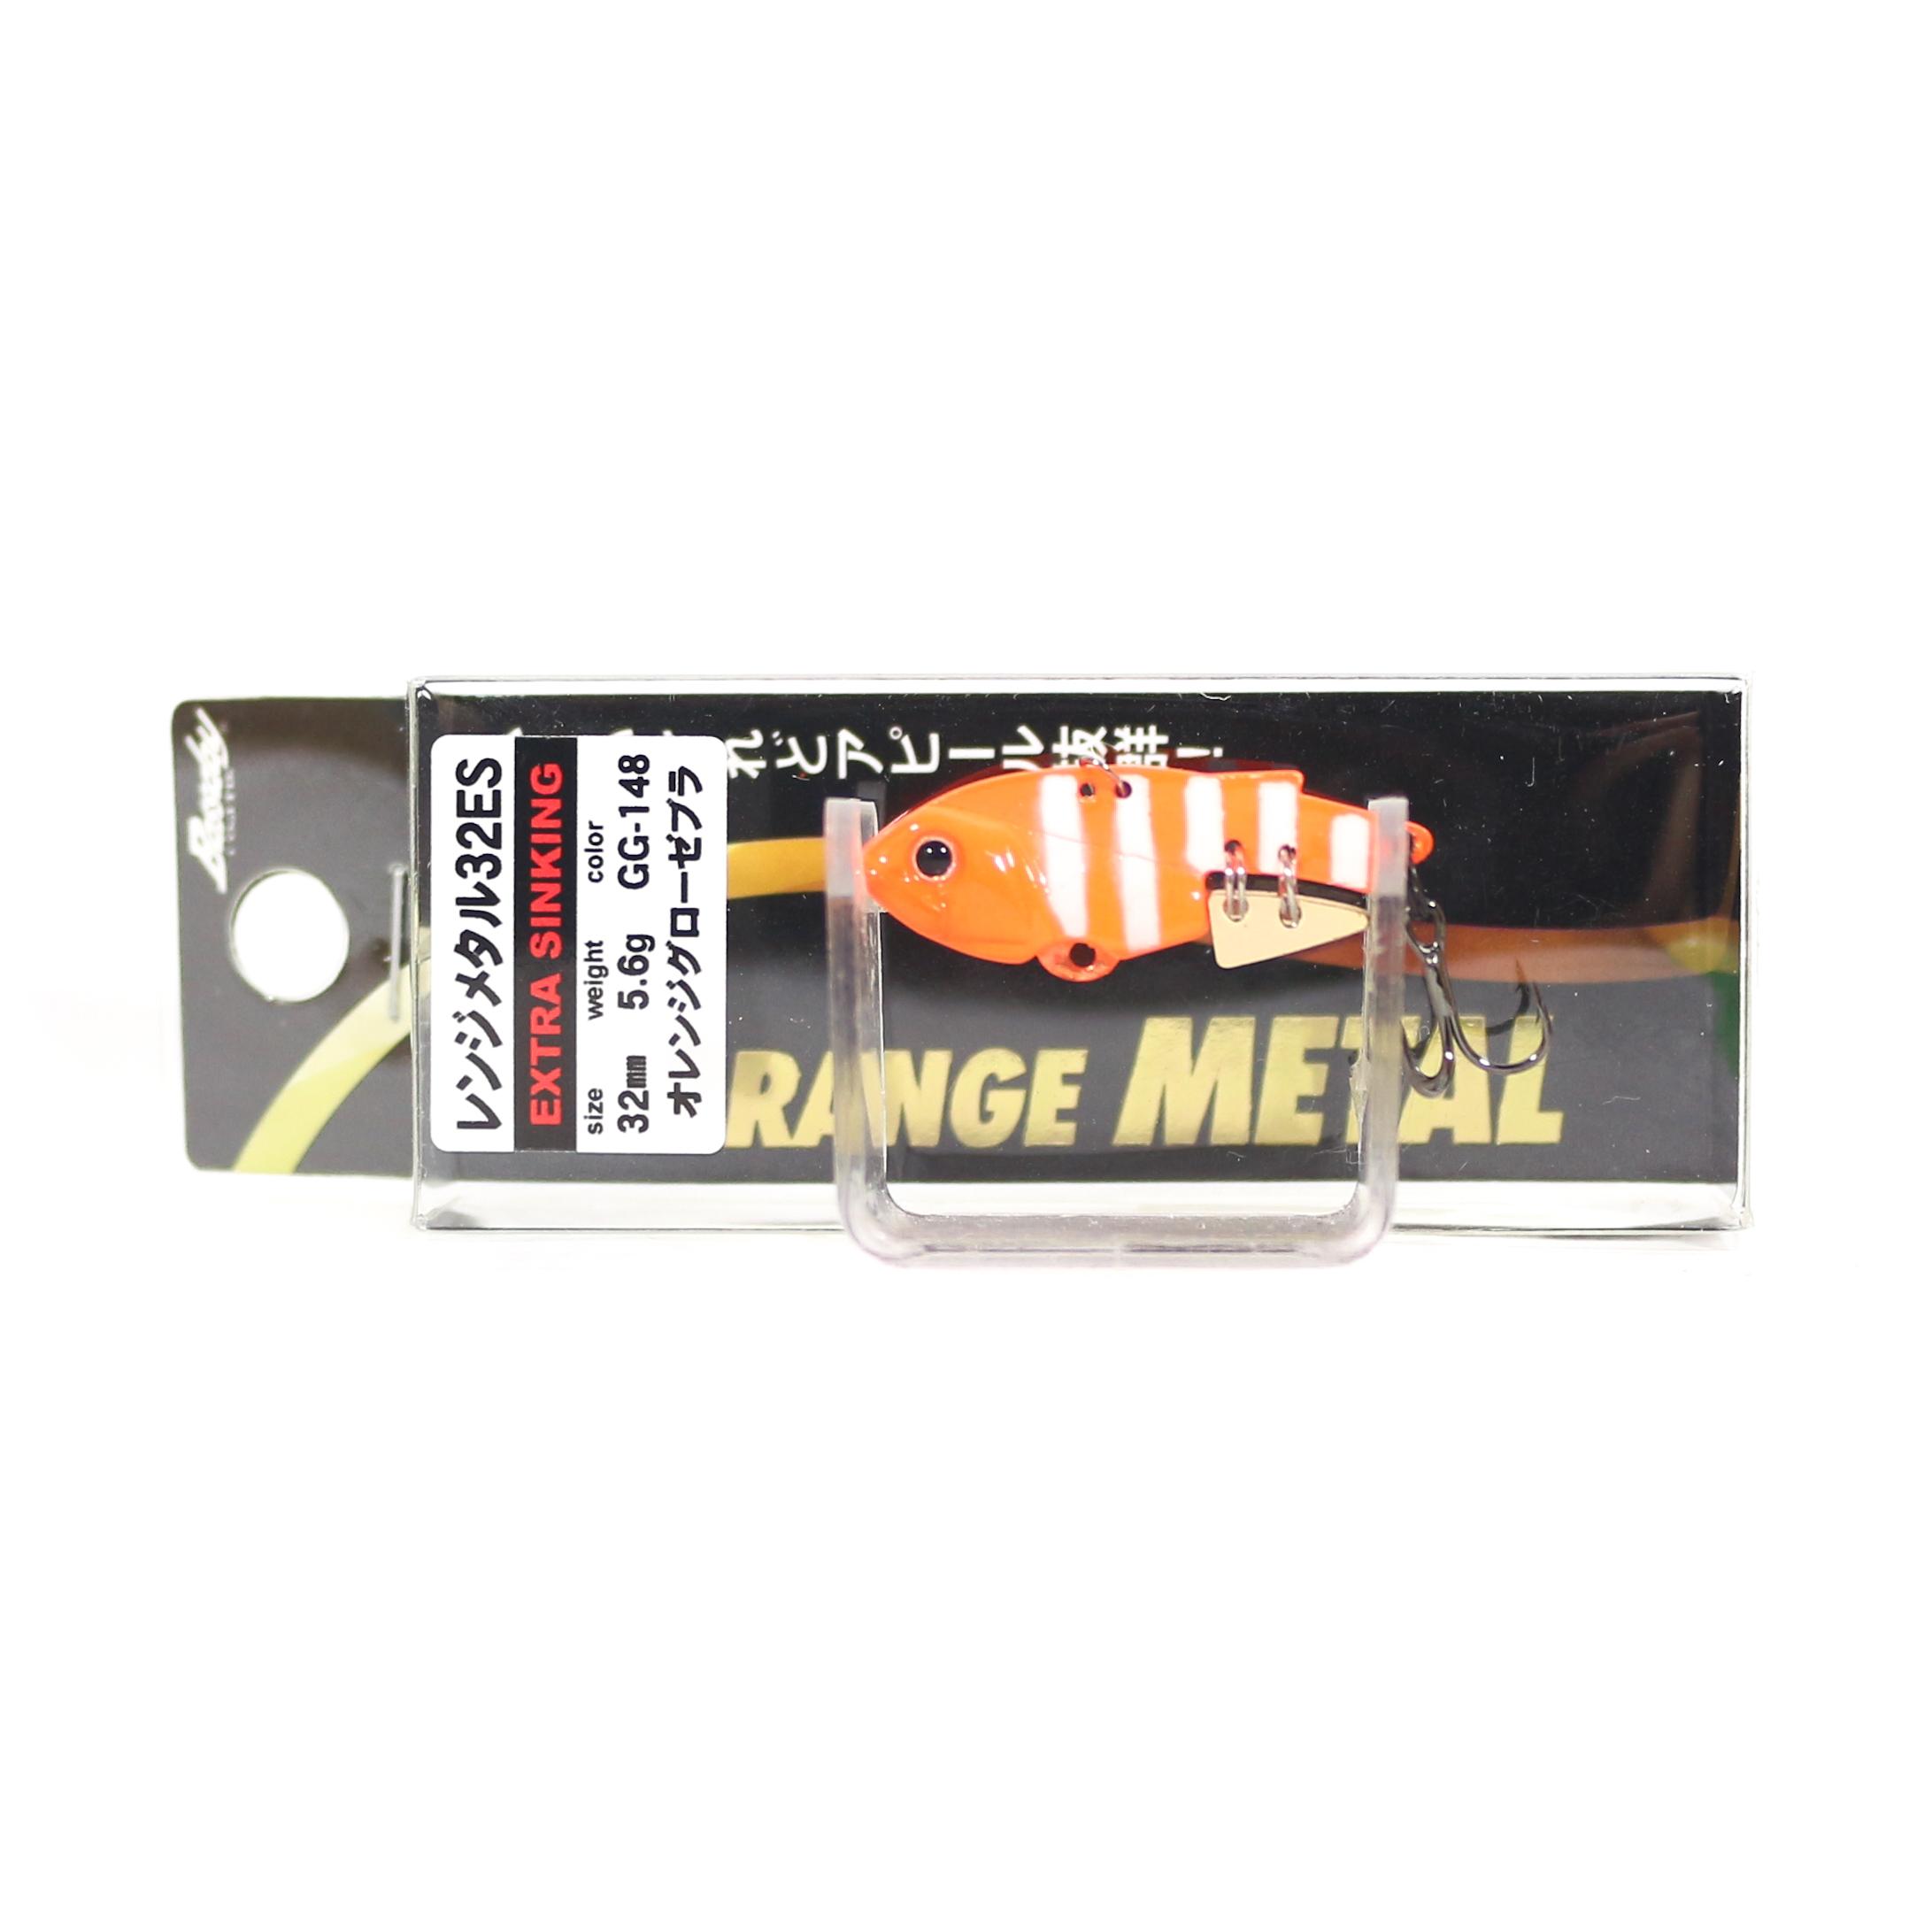 Bassday Range Metal 32ES Vibration Lure 5.6 grams GG-148 (9155)